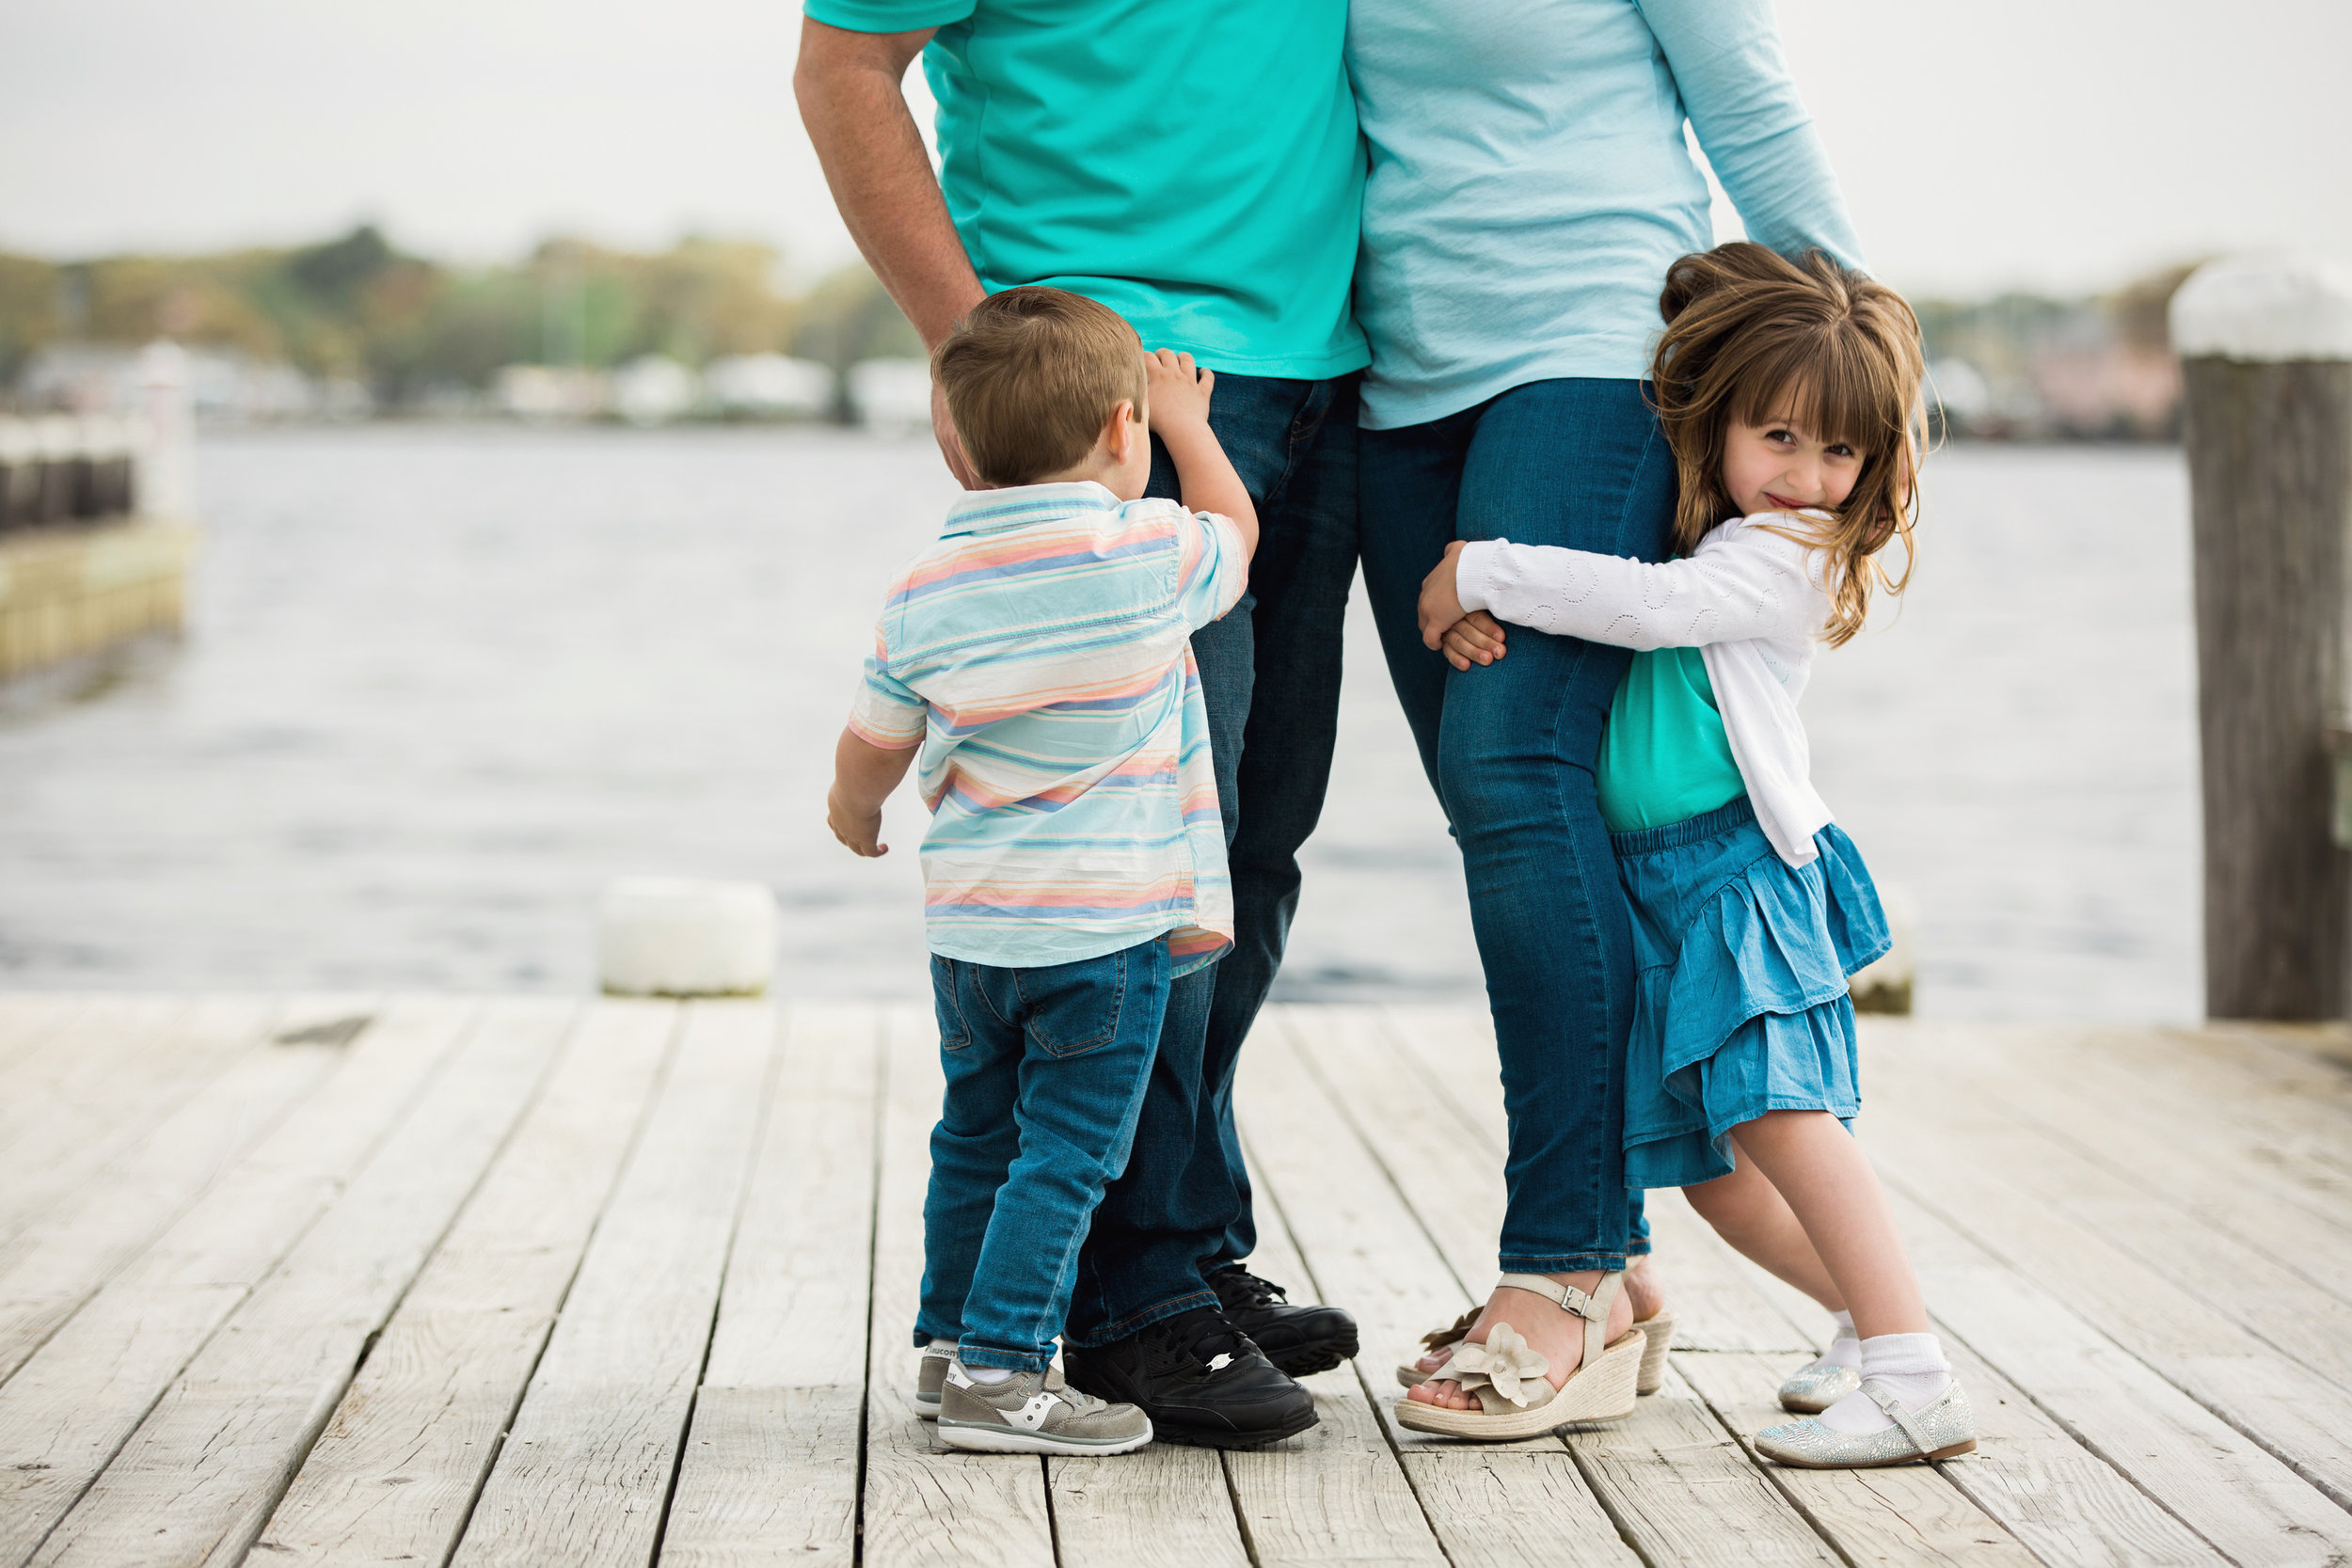 CindyGiovagnoliPhotography_Seattle_Washington_PNW_Family_Childrens_Portraits_Photography-015.jpg